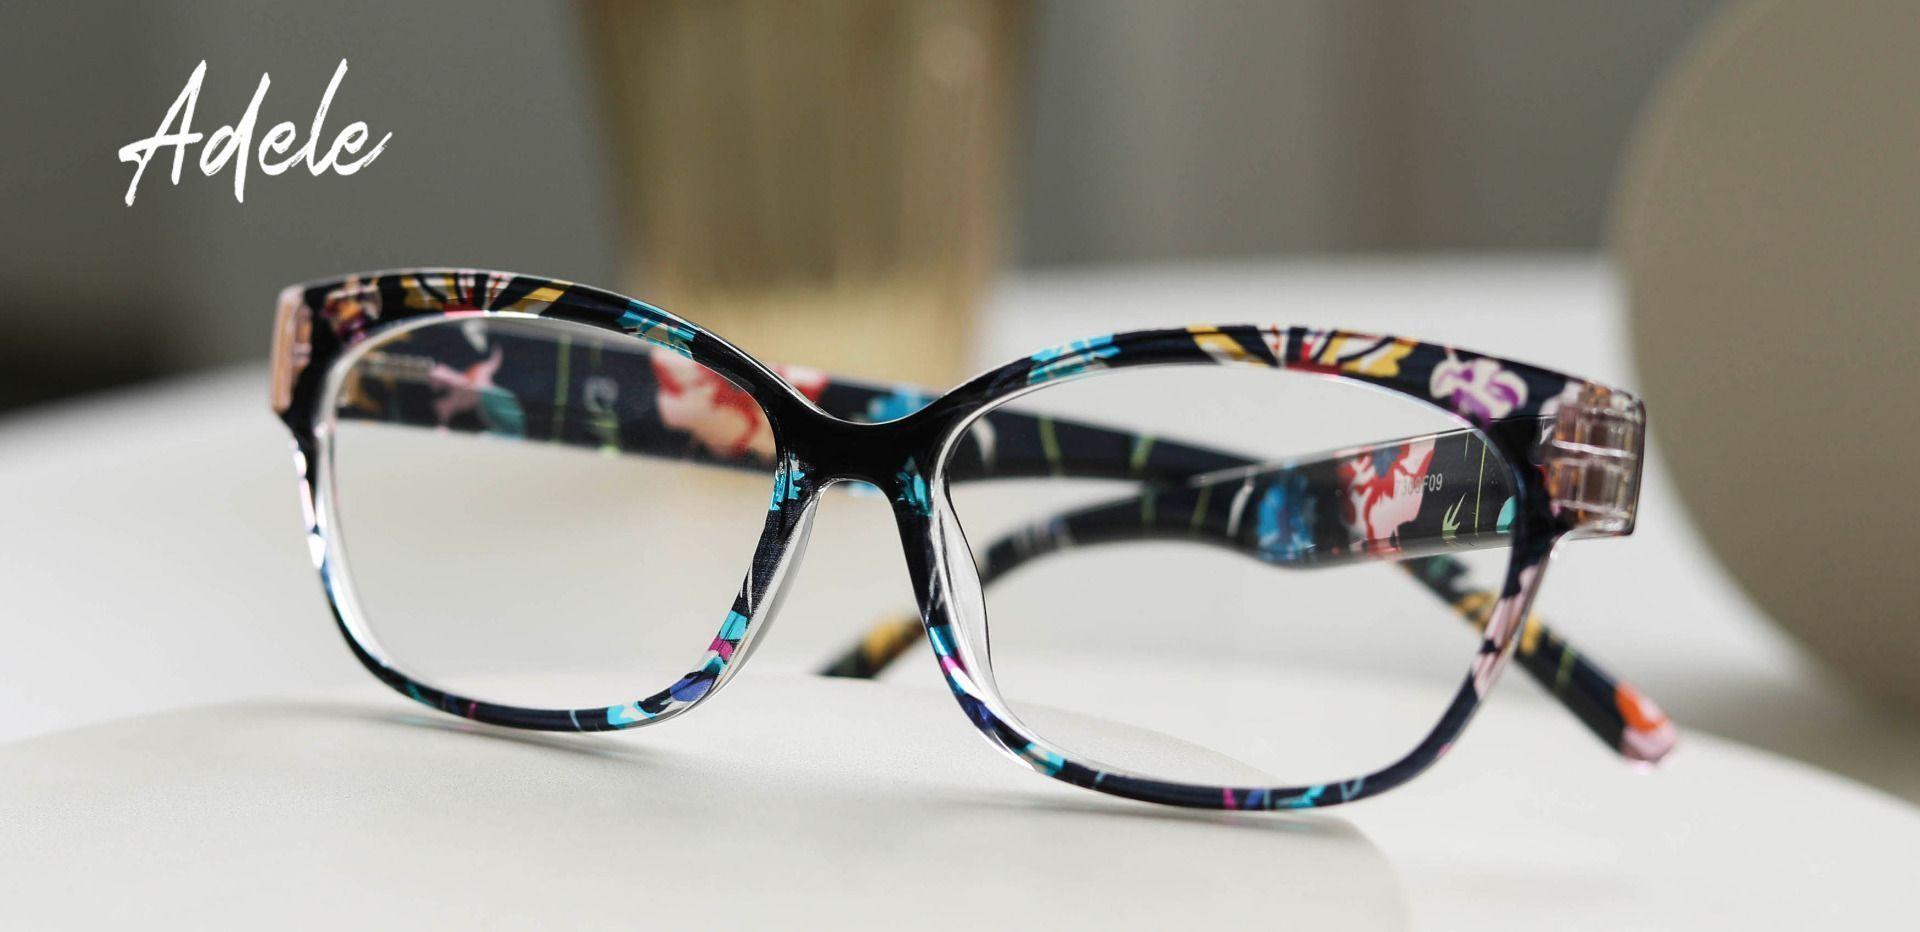 Adele Cat-Eye Prescription Glasses - Floral